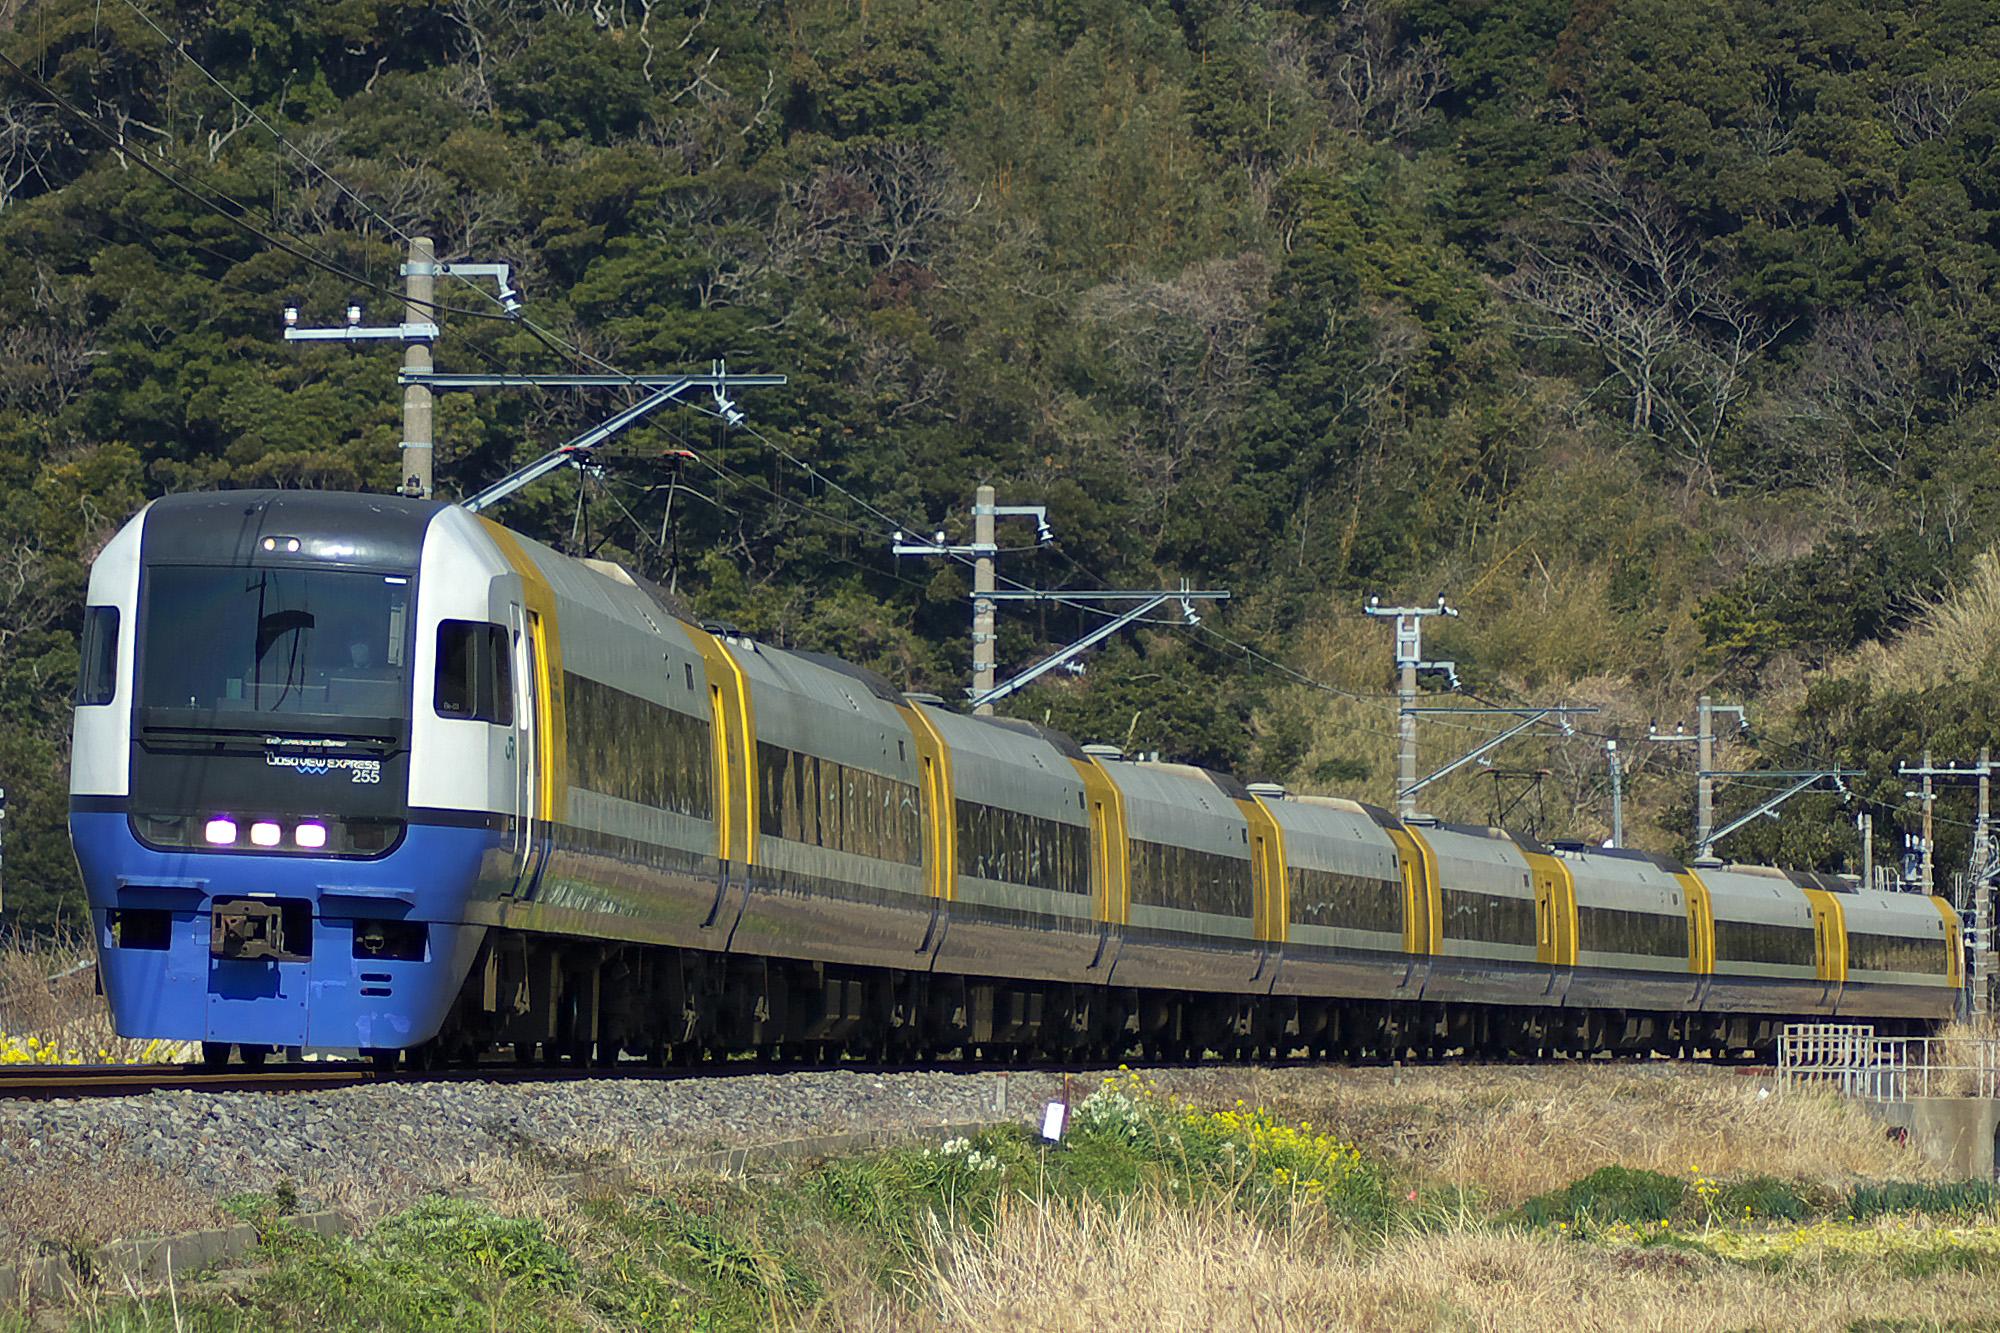 File:JR East 255 Limited Express Sazanami.jpg